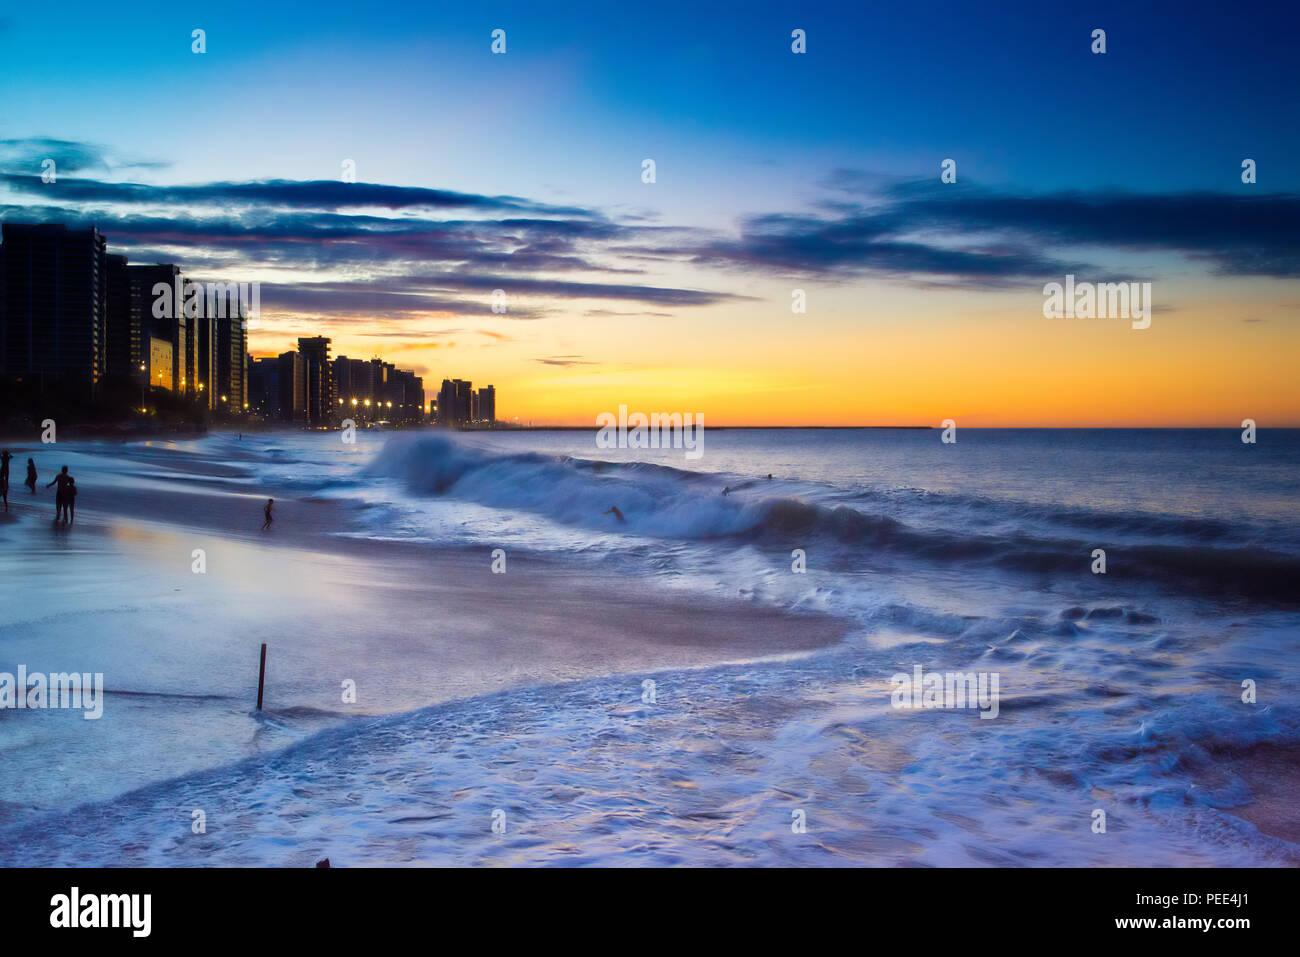 Coast Line of Fortaleza, Ceara State, city of northeast of Brazil . Stock Photo